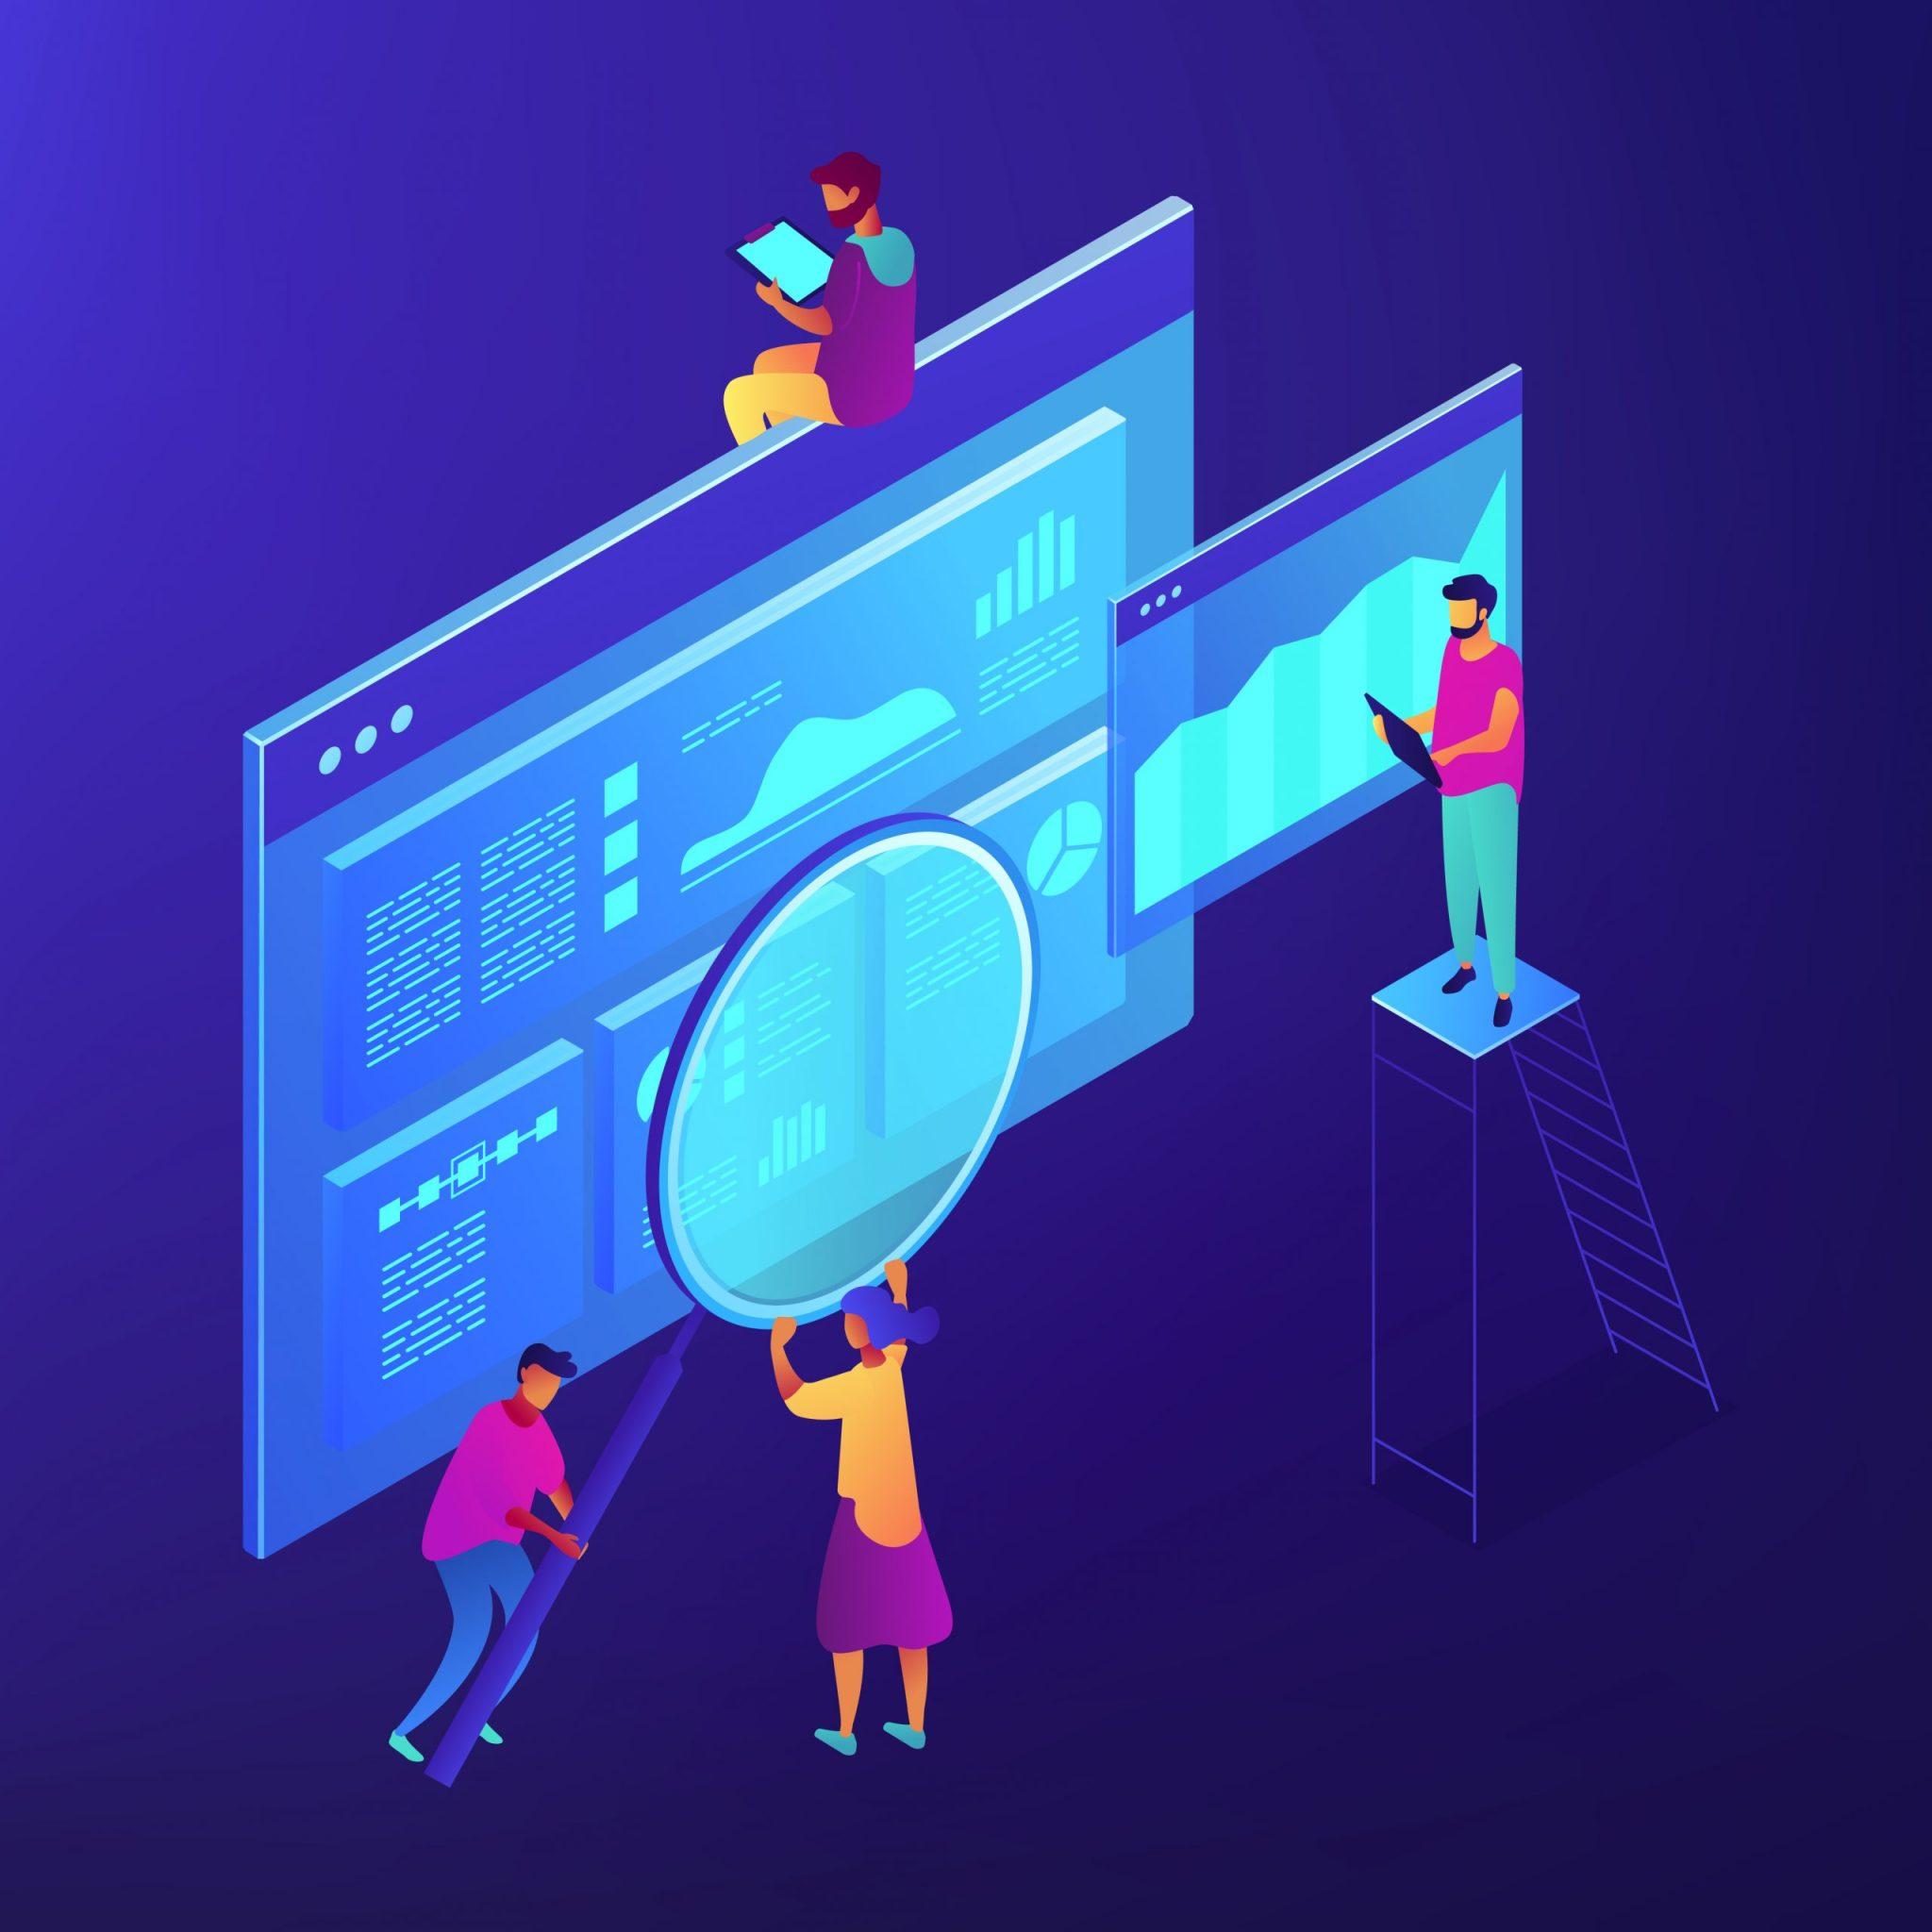 computer screens - combining data